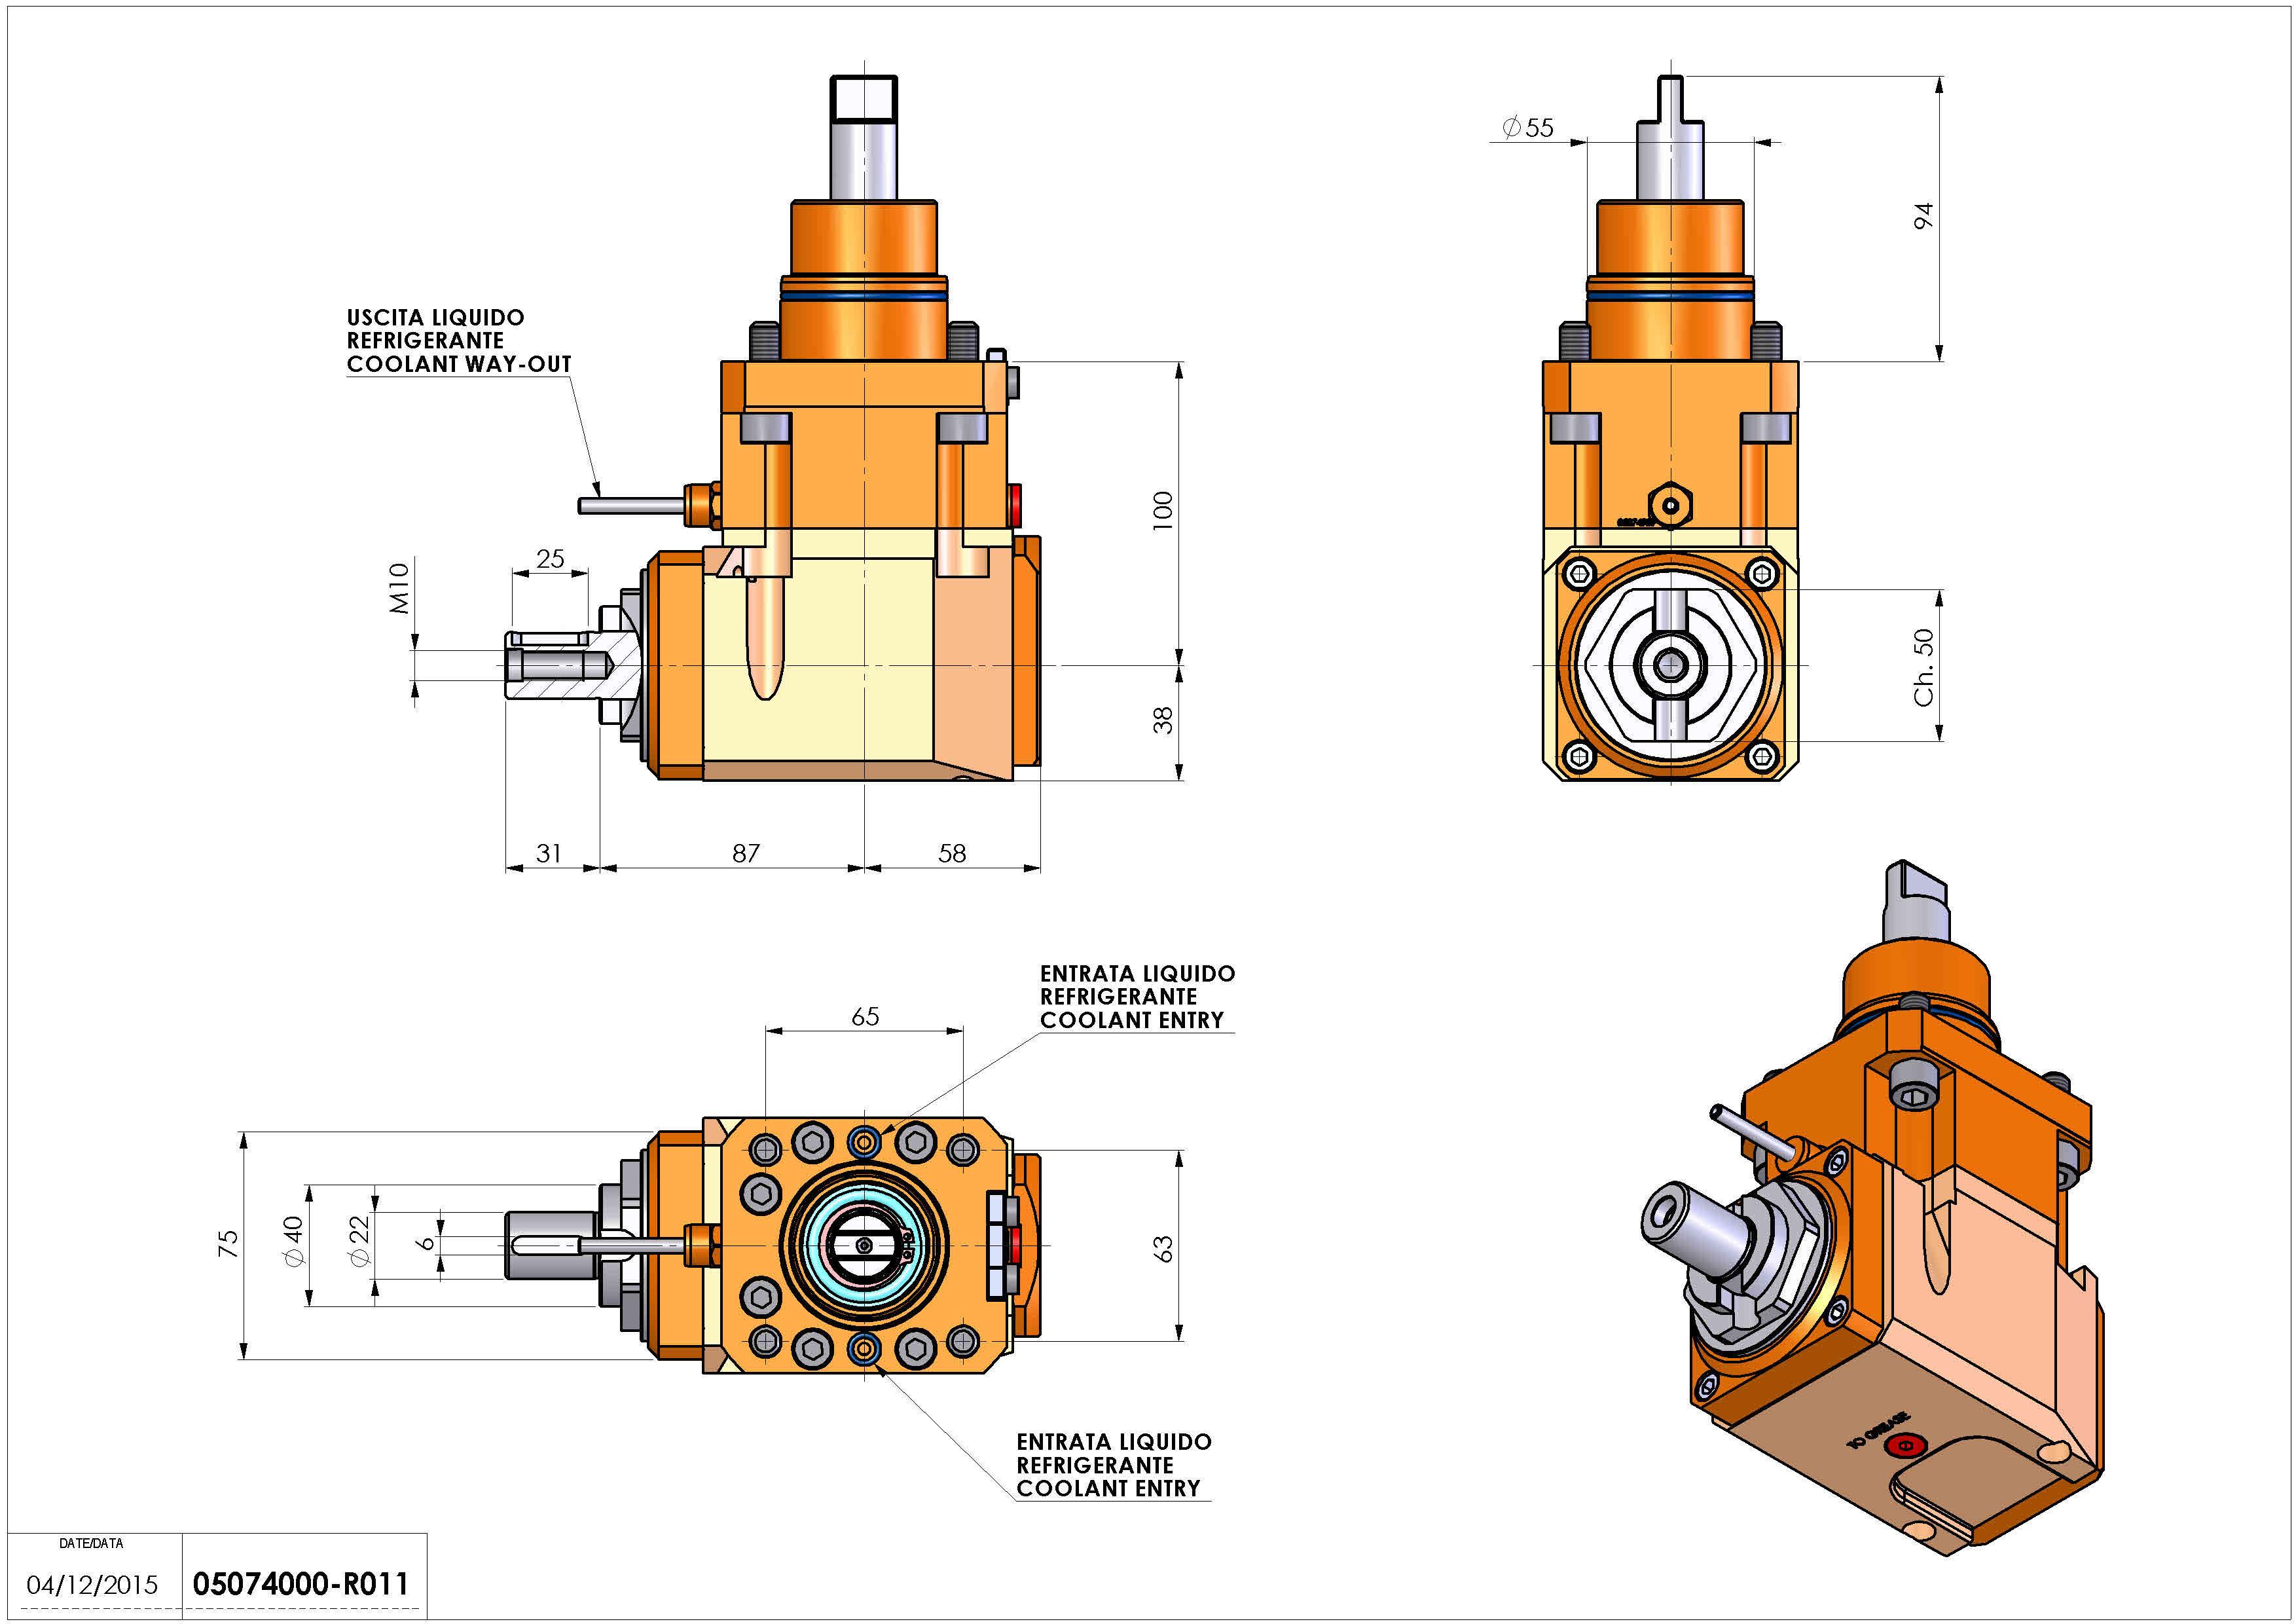 Technical image - LT-A D55 DIN138-22 LR H100 BI.